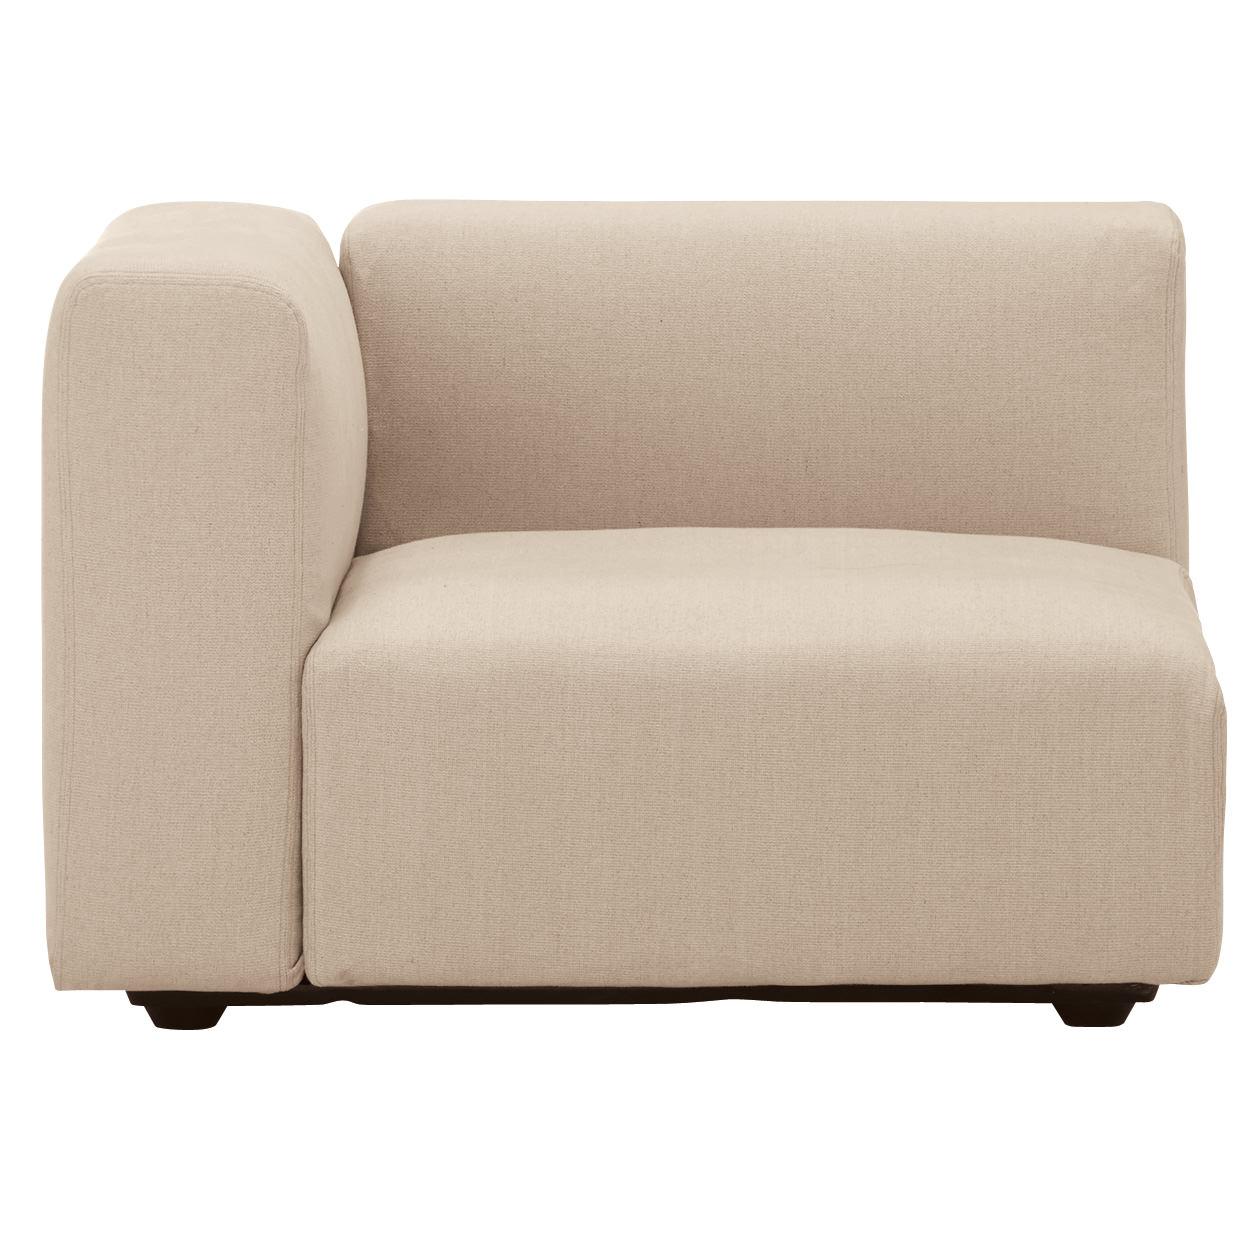 Unit Sofa With Armrest